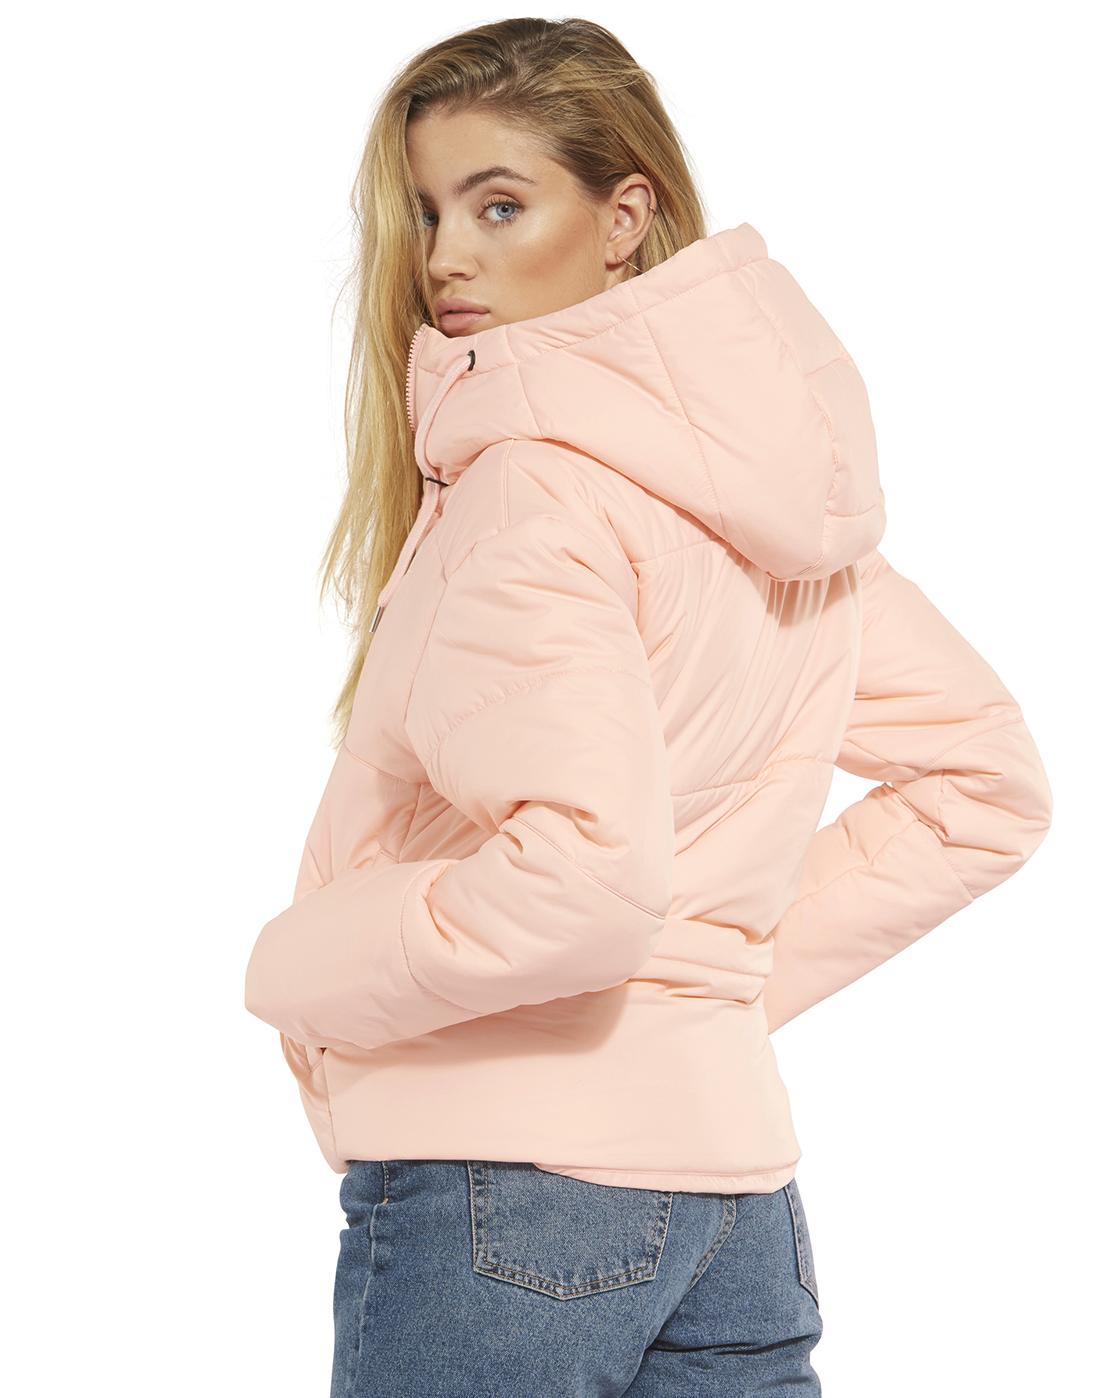 e468050c4a82 Womens Padded Reversible Jacket · Womens Padded Reversible Jacket ...